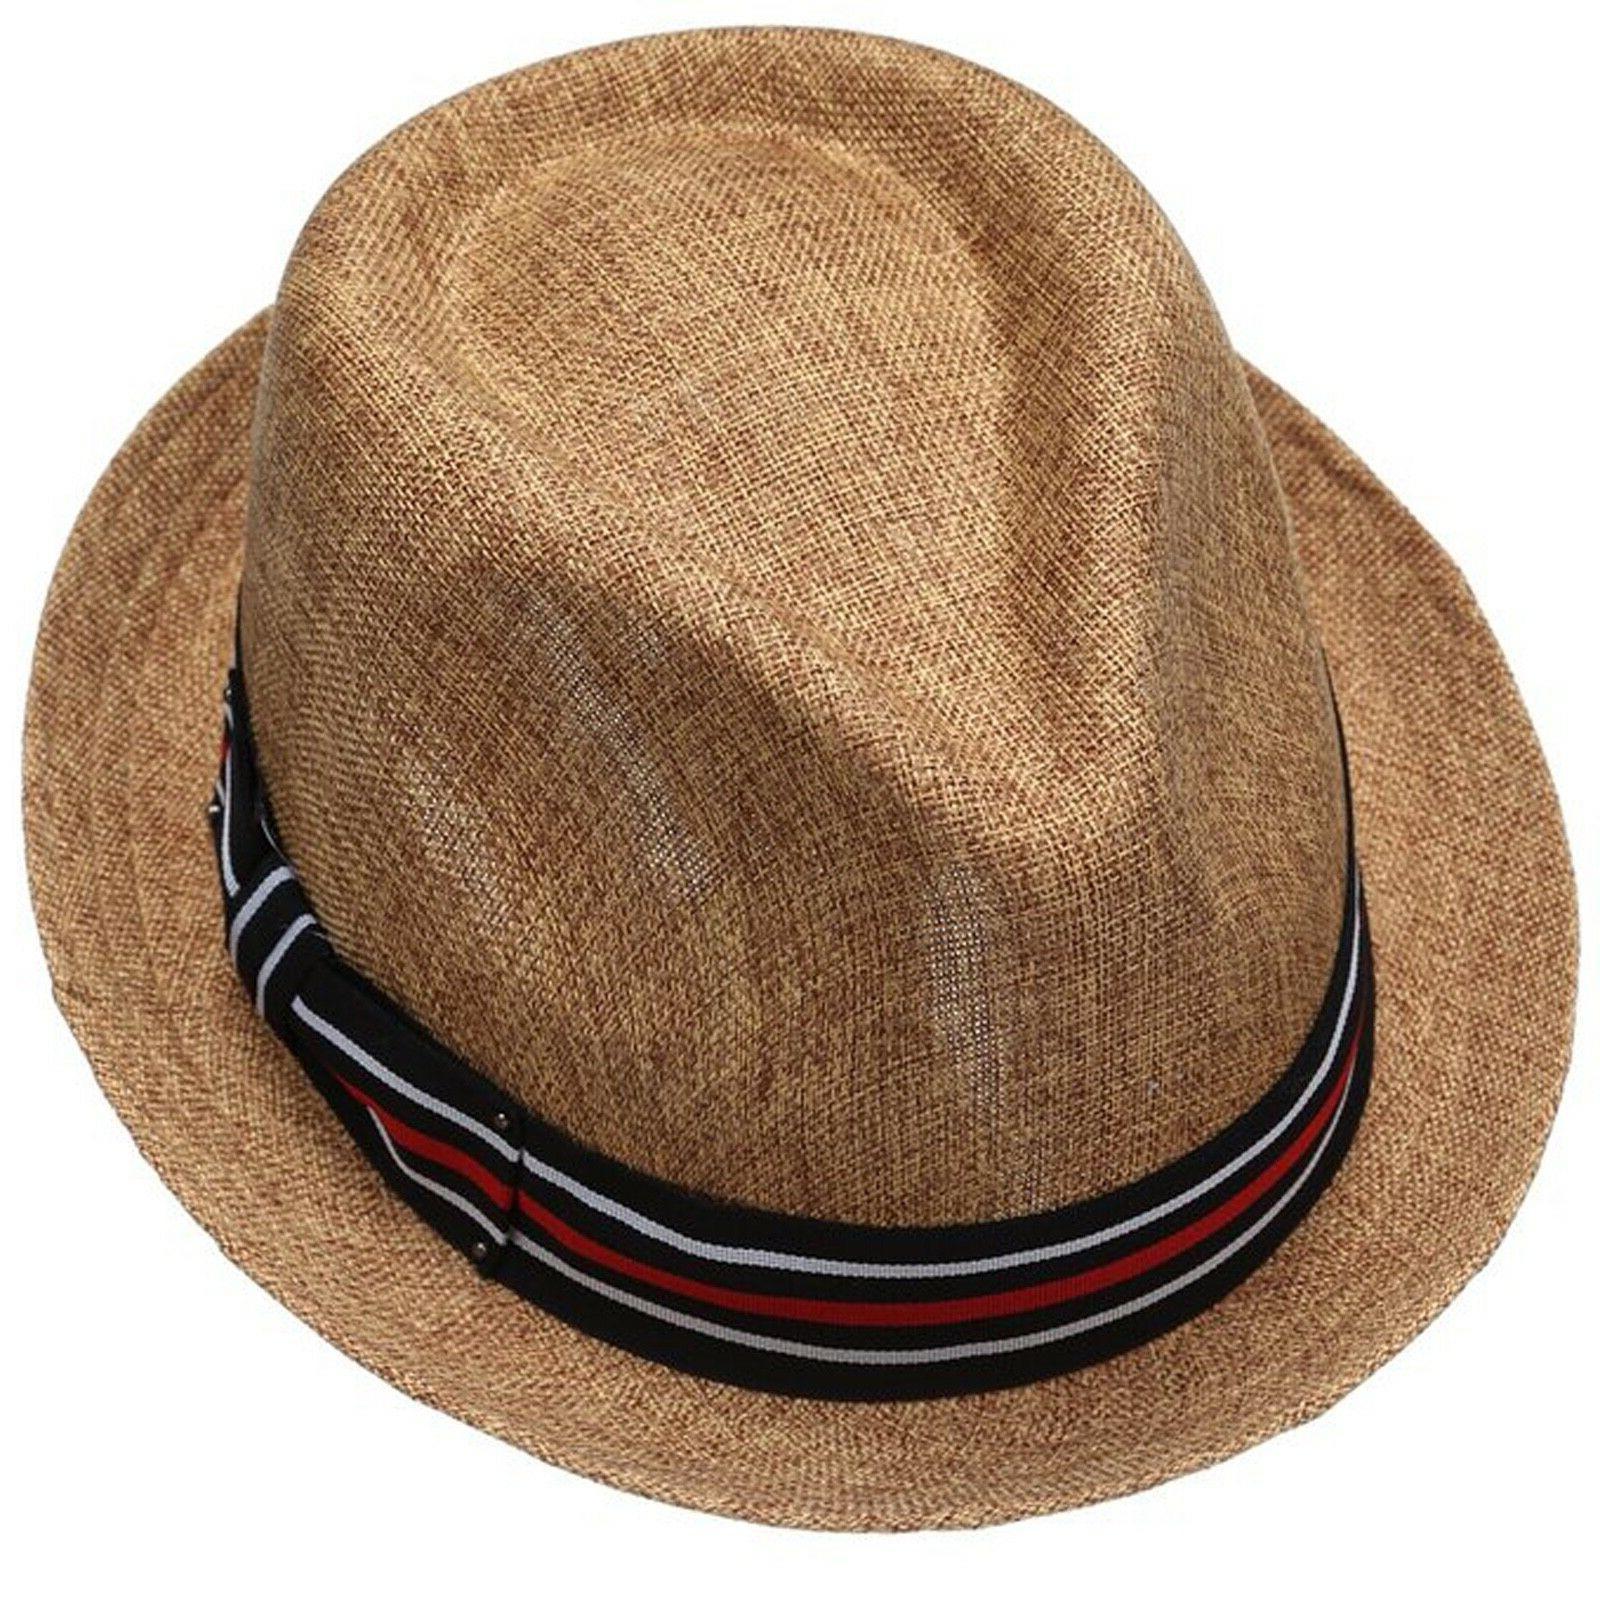 Mens Fedora Hat Stingy Brim Porkpie Dress Hat Brown EPf2261